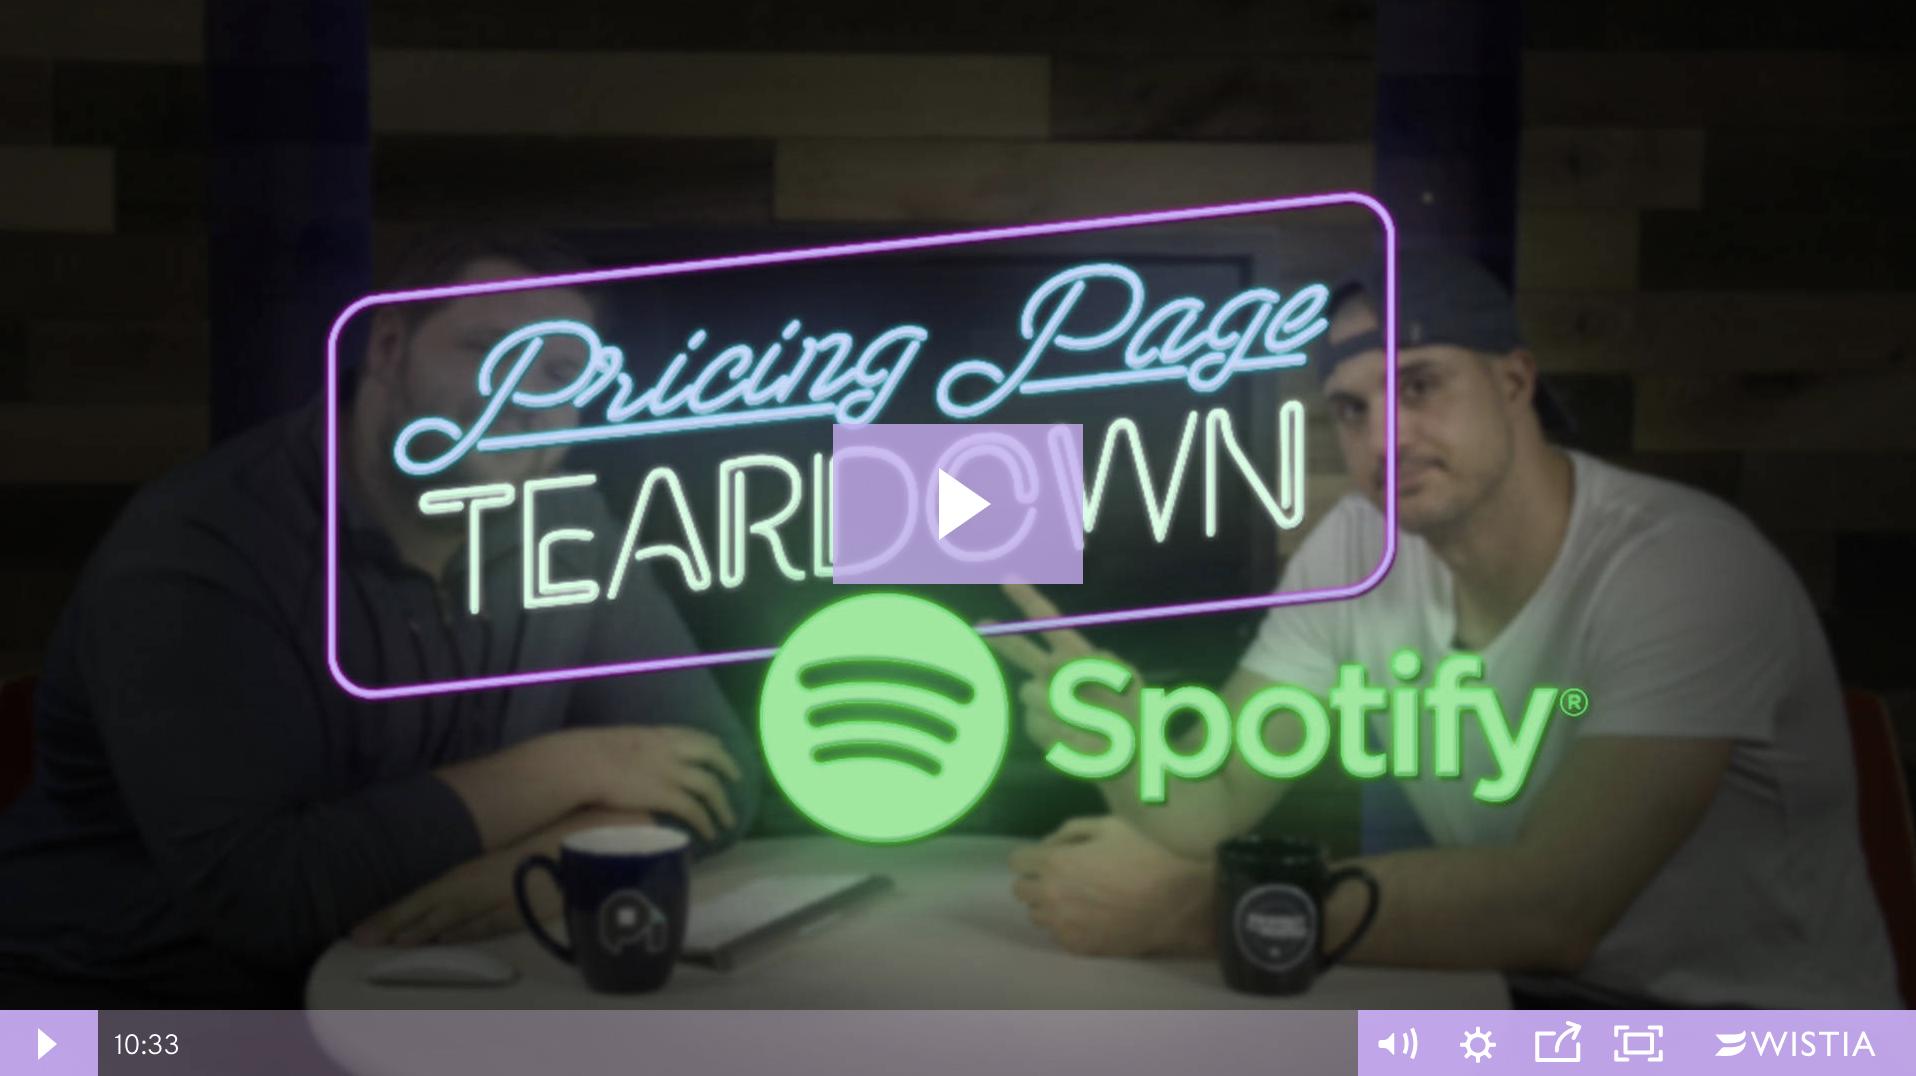 Pricing Page Teardown Episode 3: Spotify BLOG